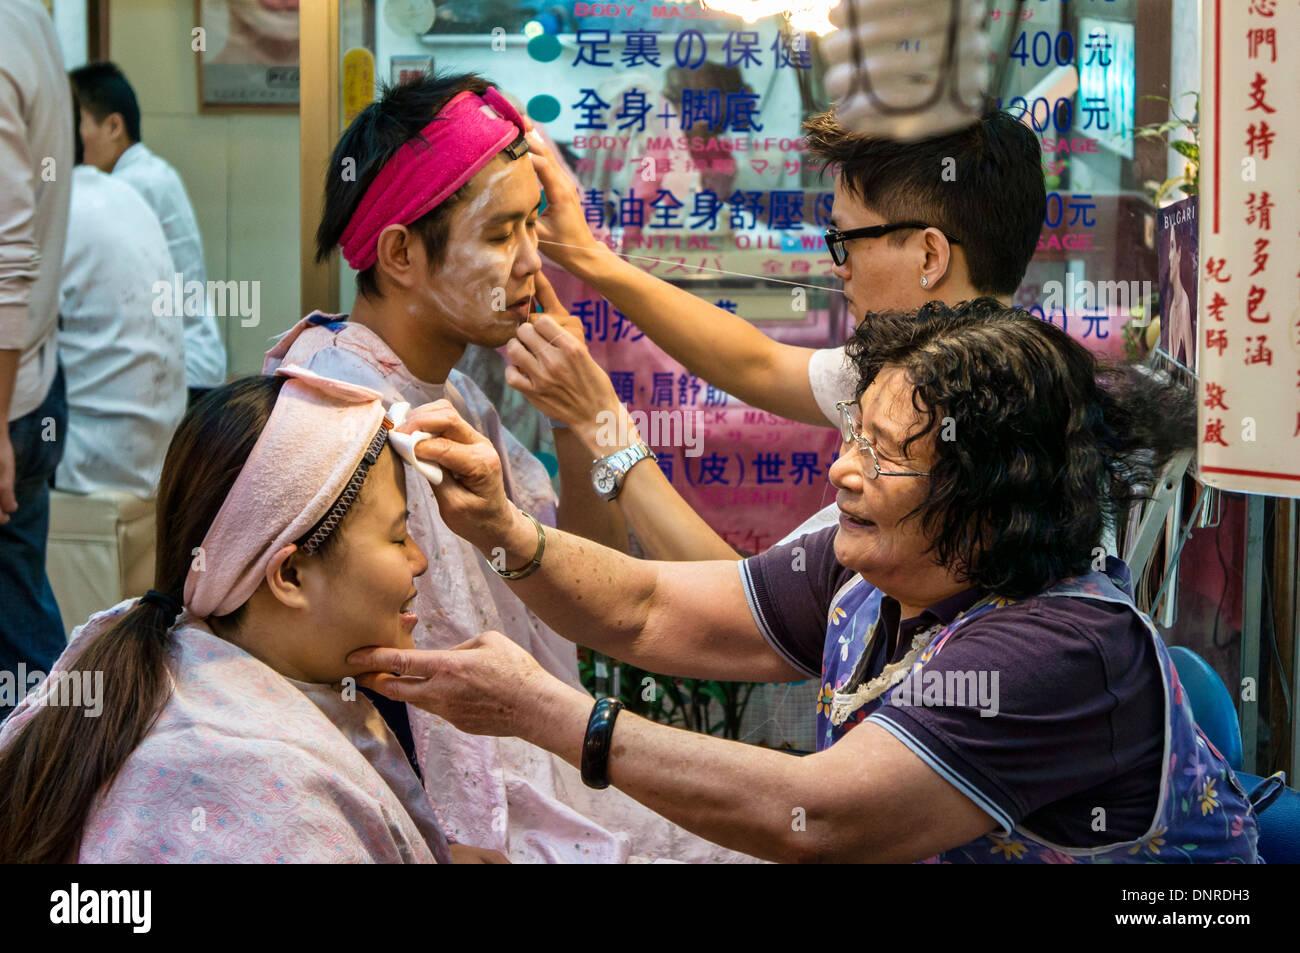 Facial Threading, a Chinese Traditional Facial Technique in Taipei Raohe Street Night Market, Taipei, Taiwan - Stock Image